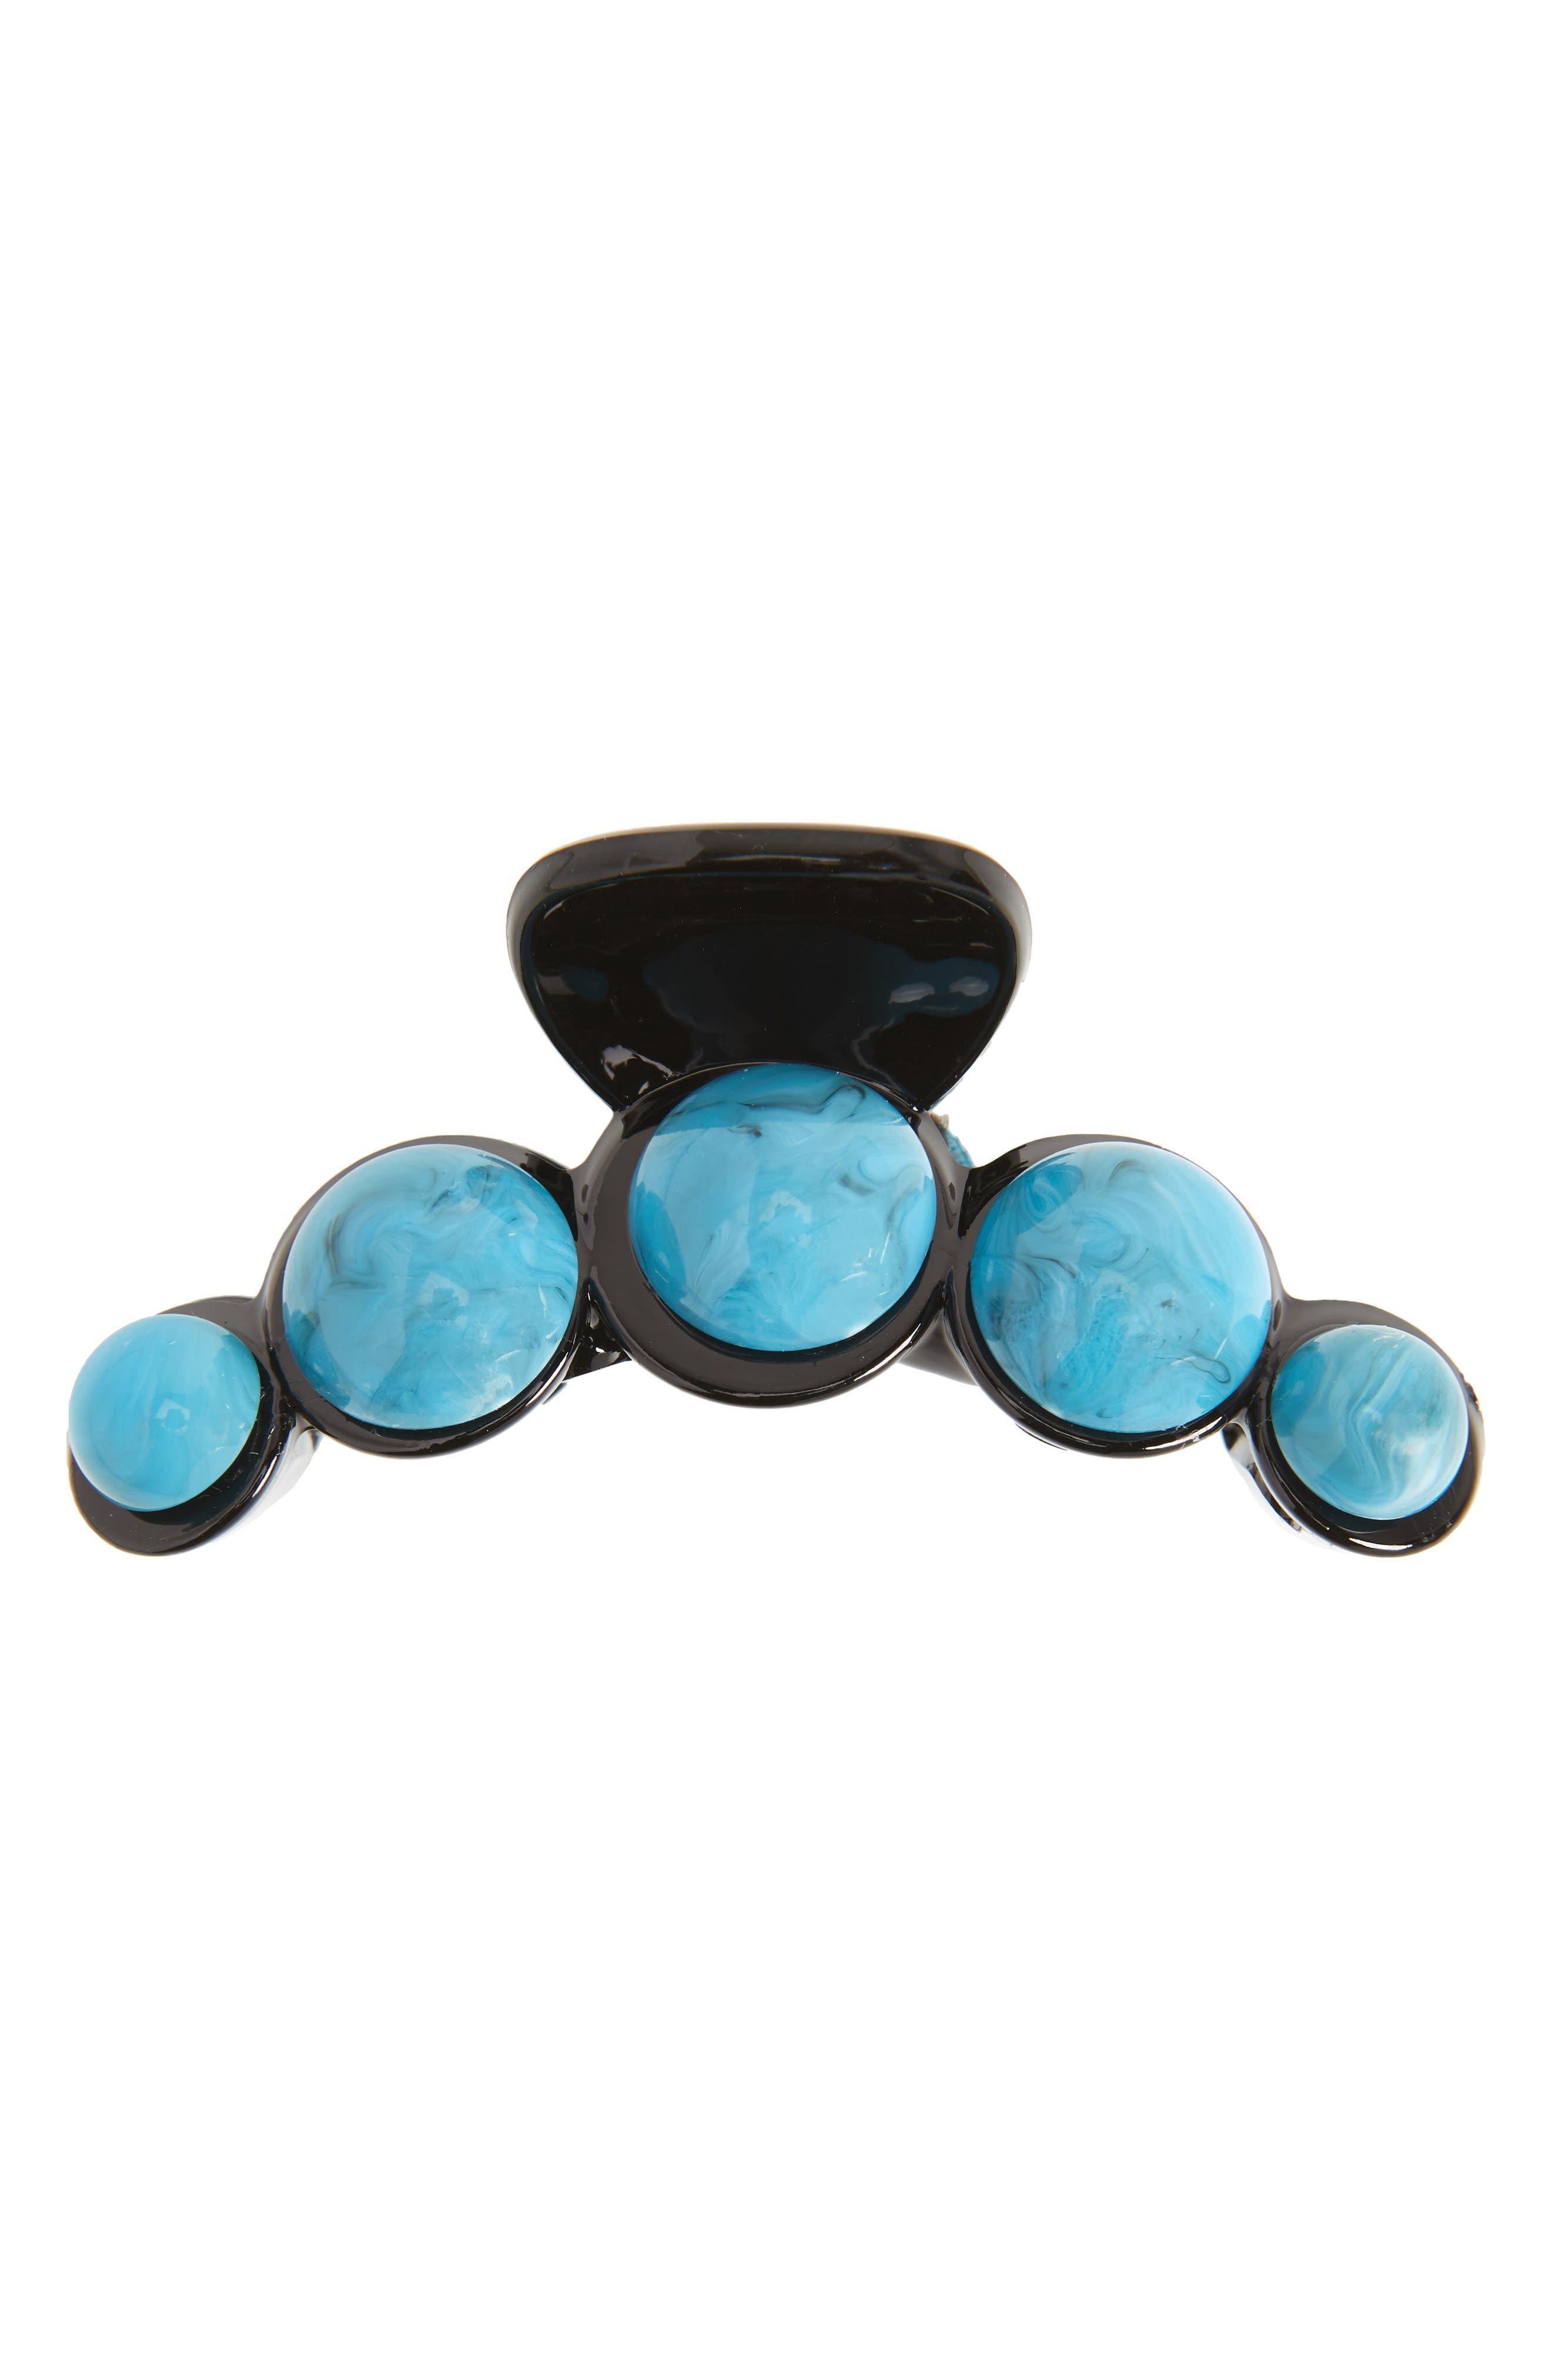 Crystal Jaw Clip,                         Main,                         color, Black/ Blue